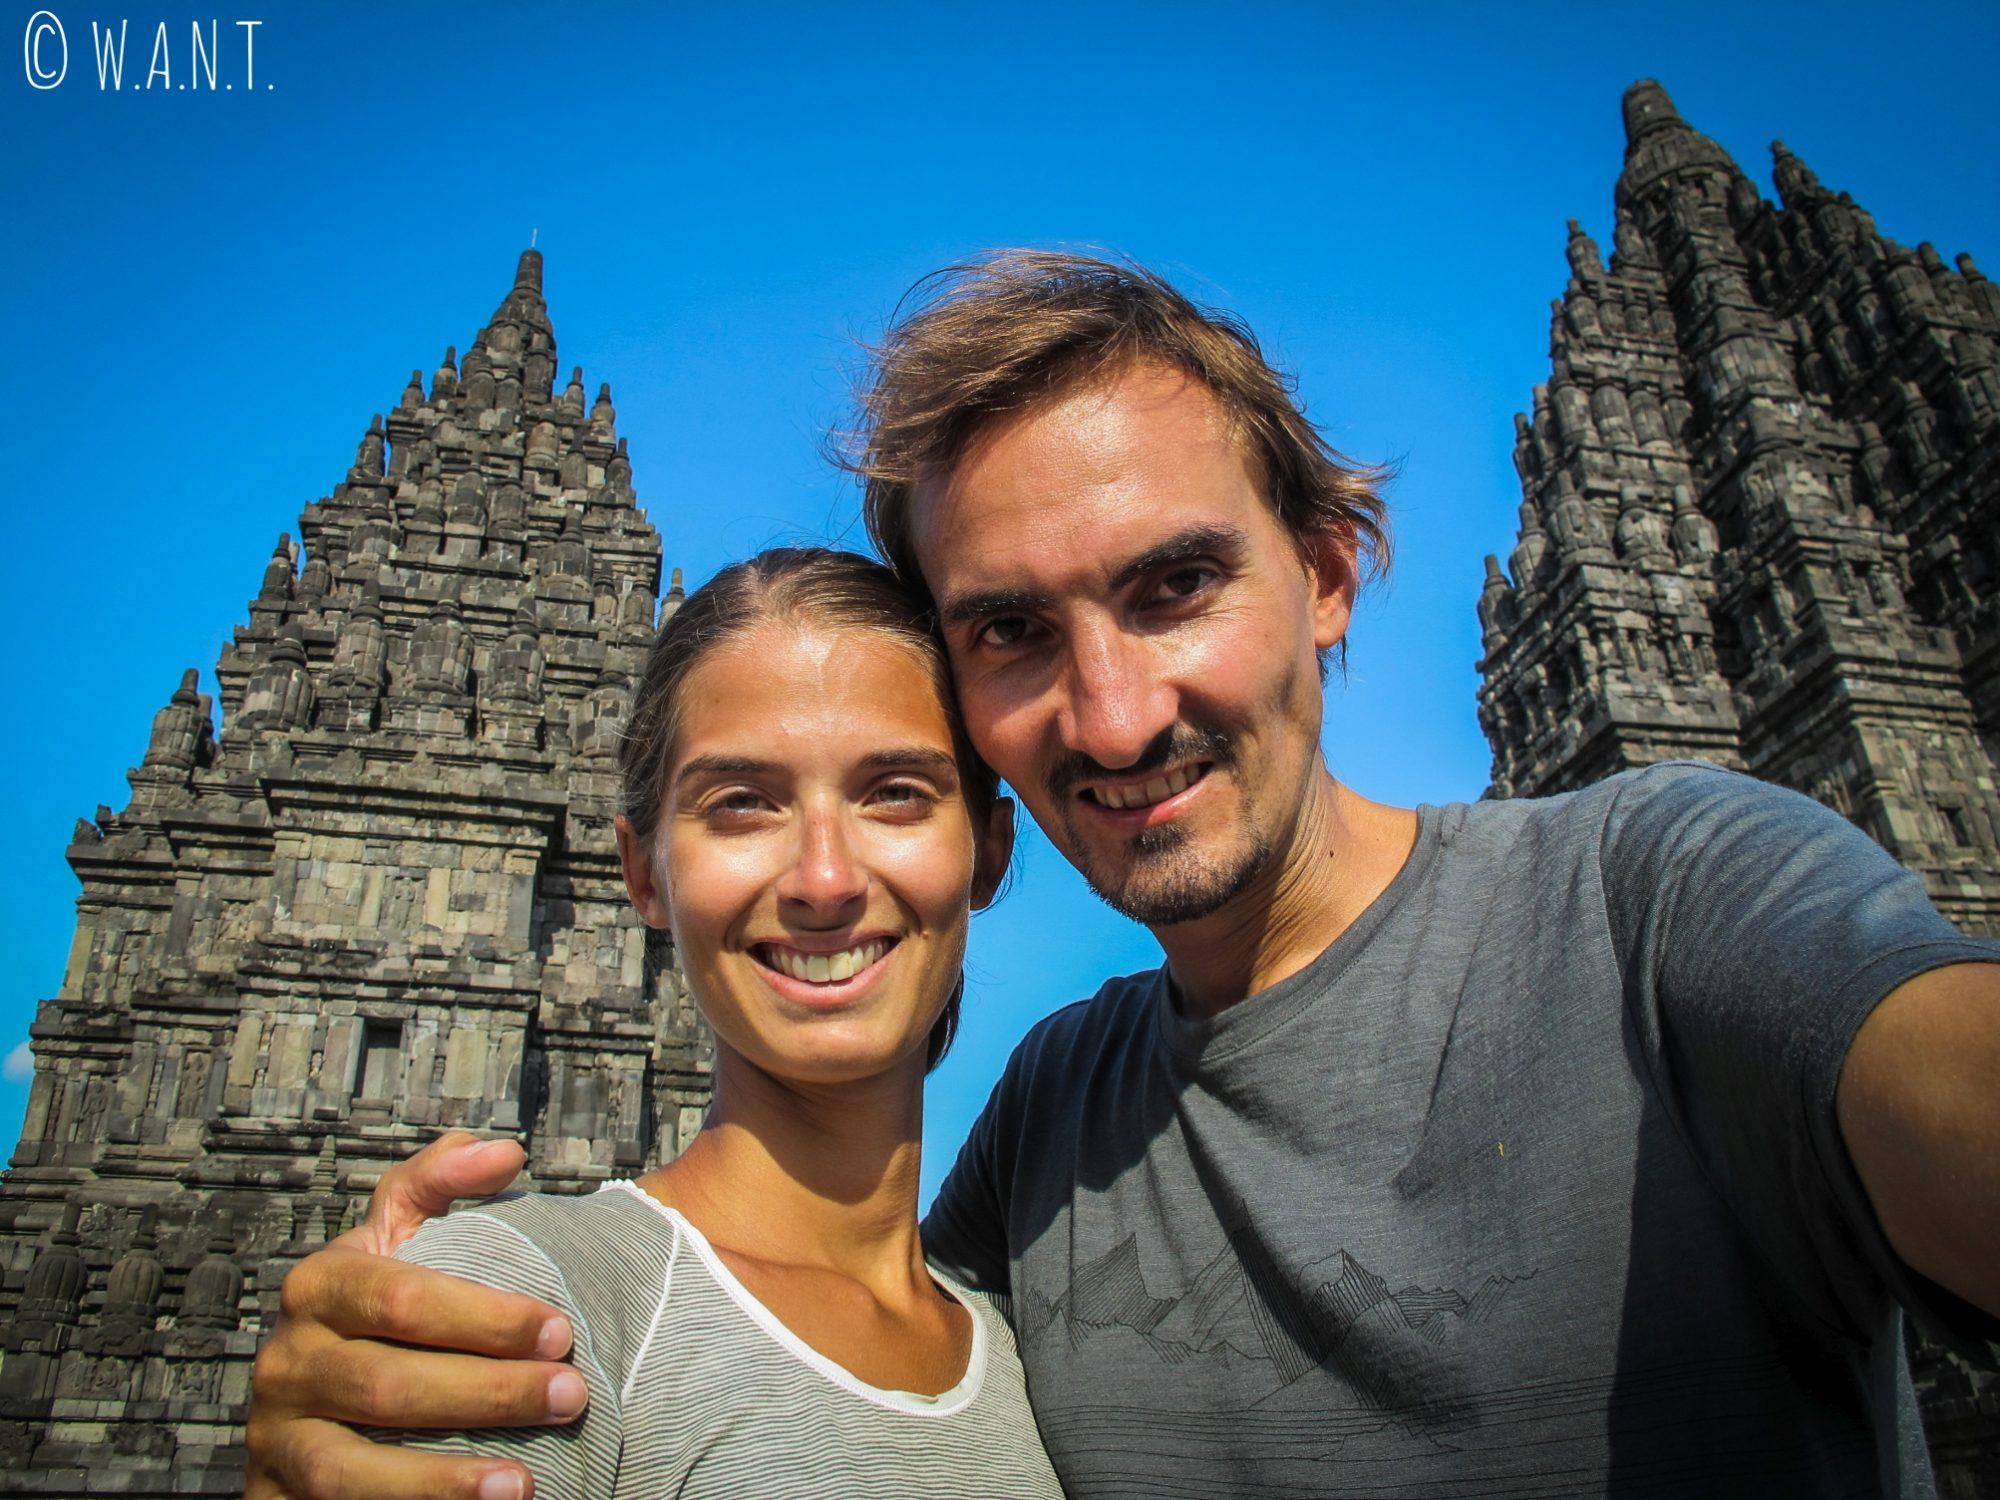 Selfie au temple de Prambanan